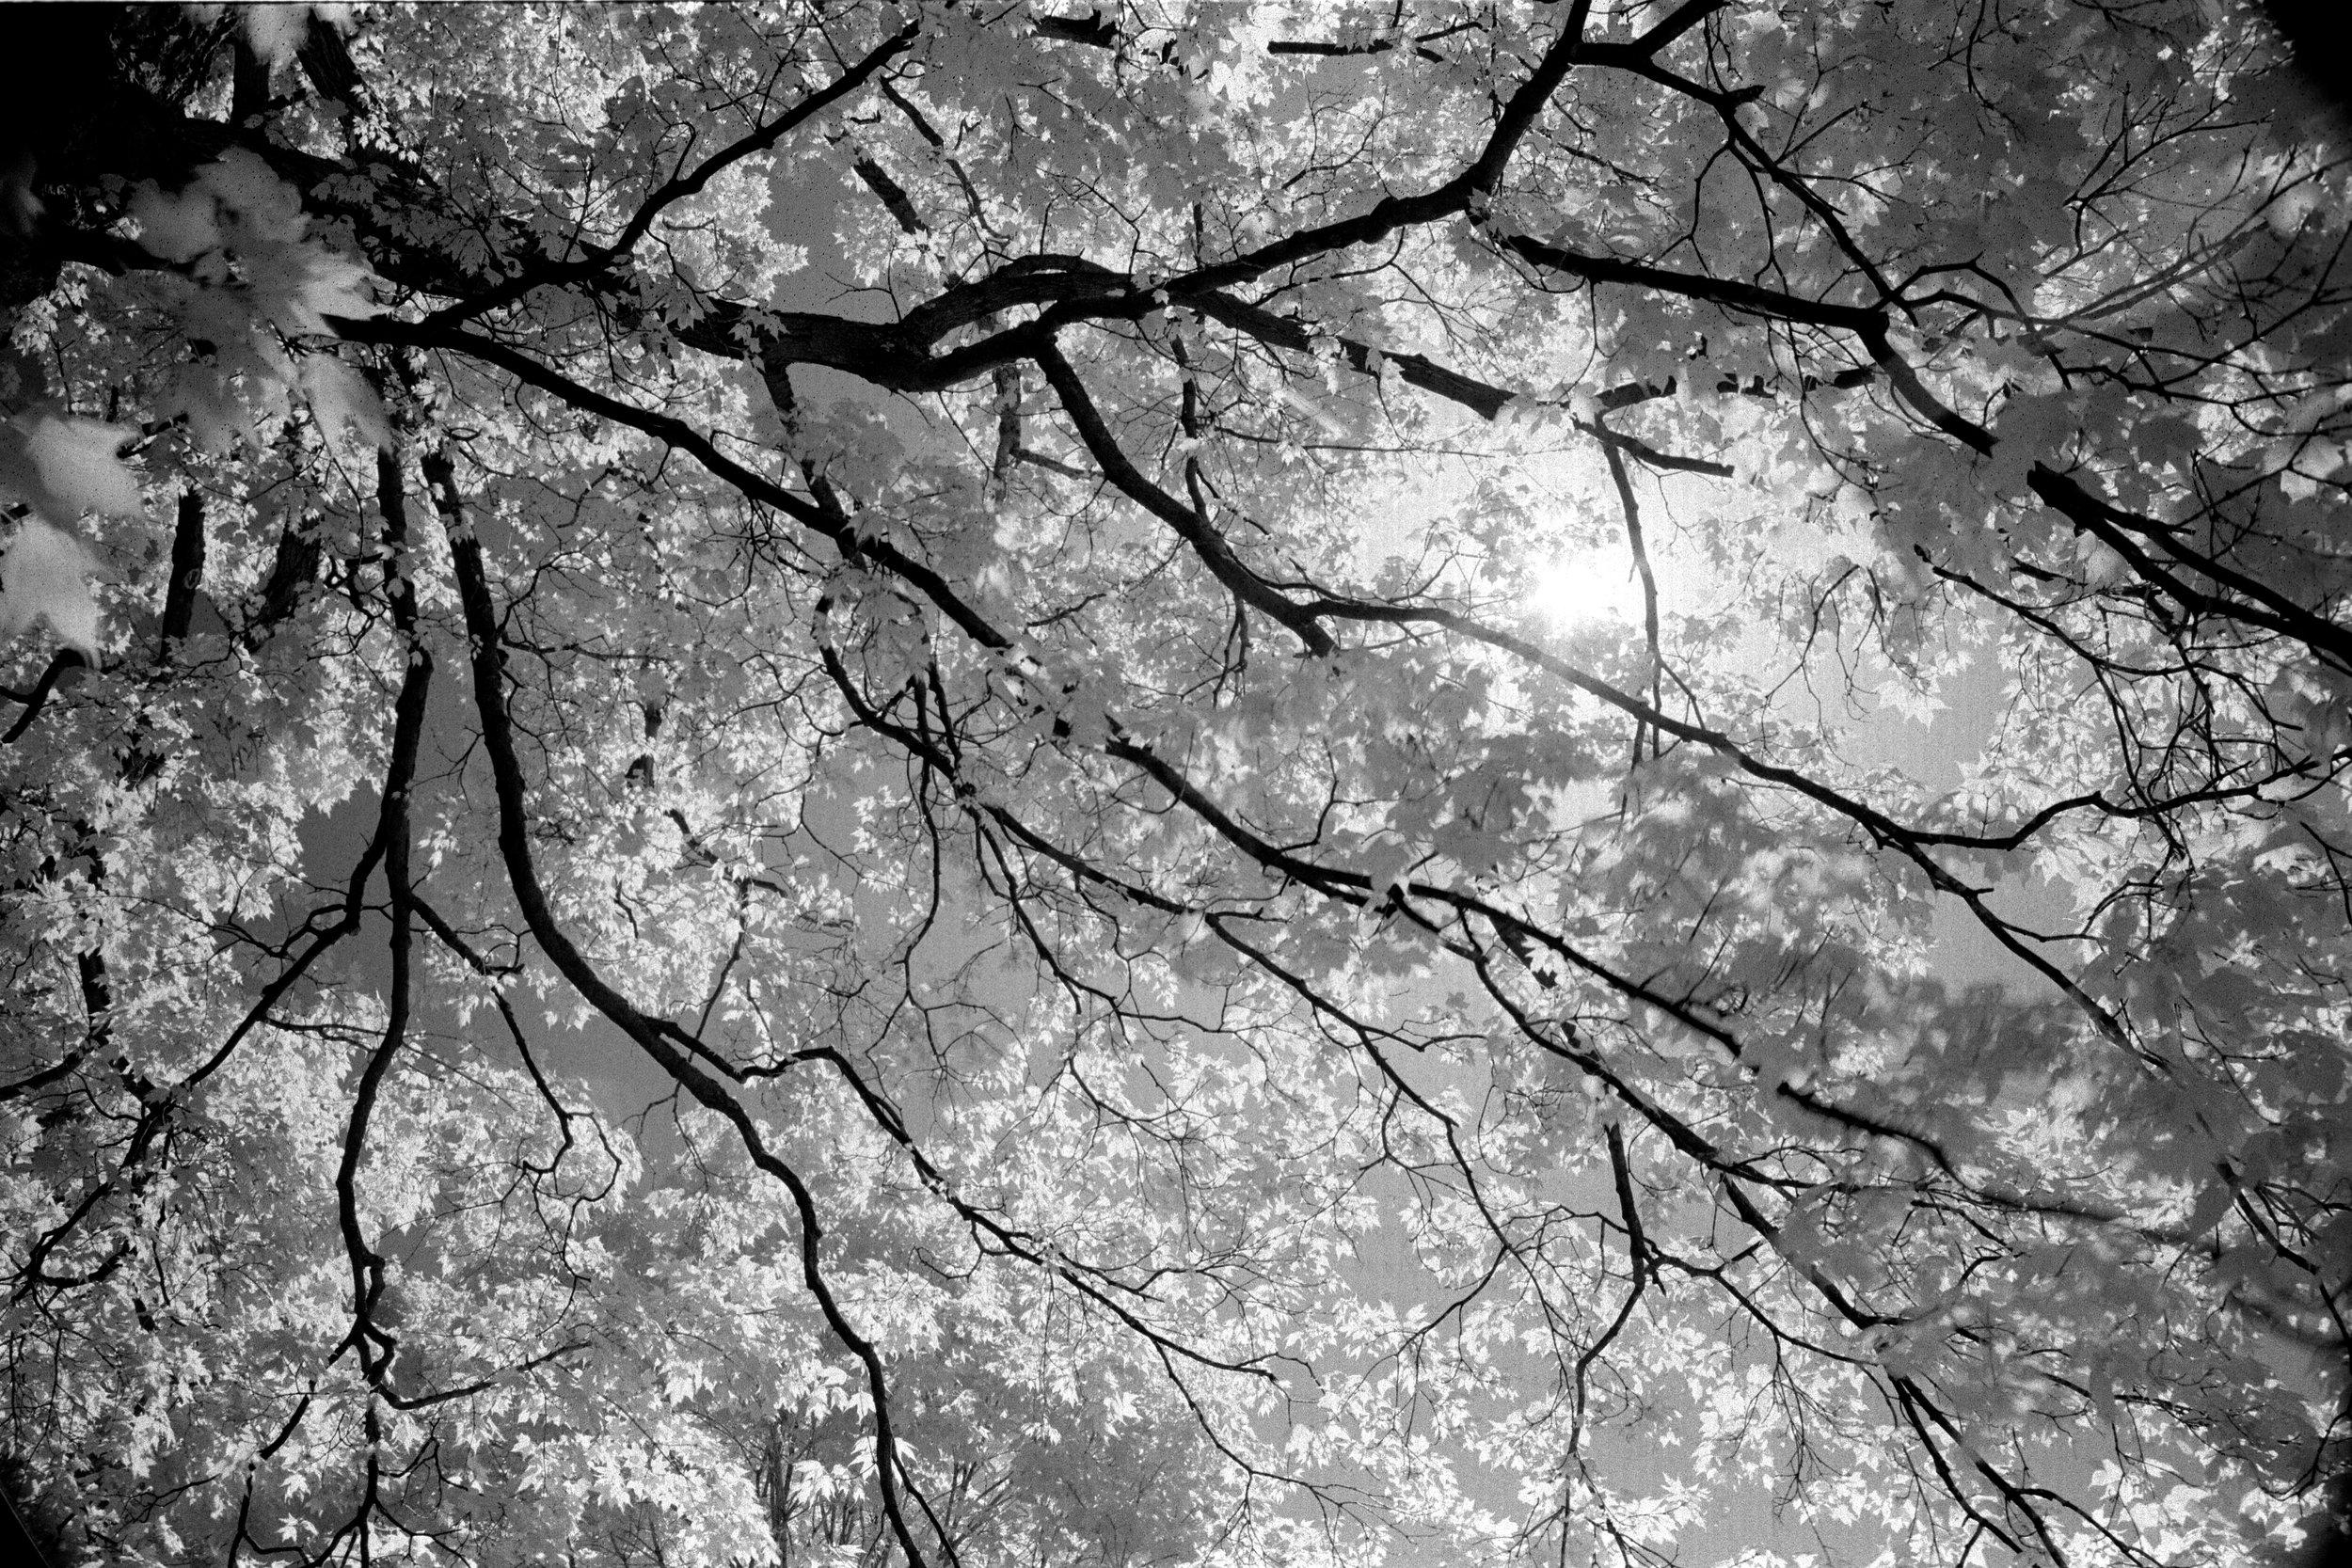 Spring Foliage at Principia College. Spring 2012. Canon EOS 630, 17-40L, Cokin 87A, Rollei IR 400